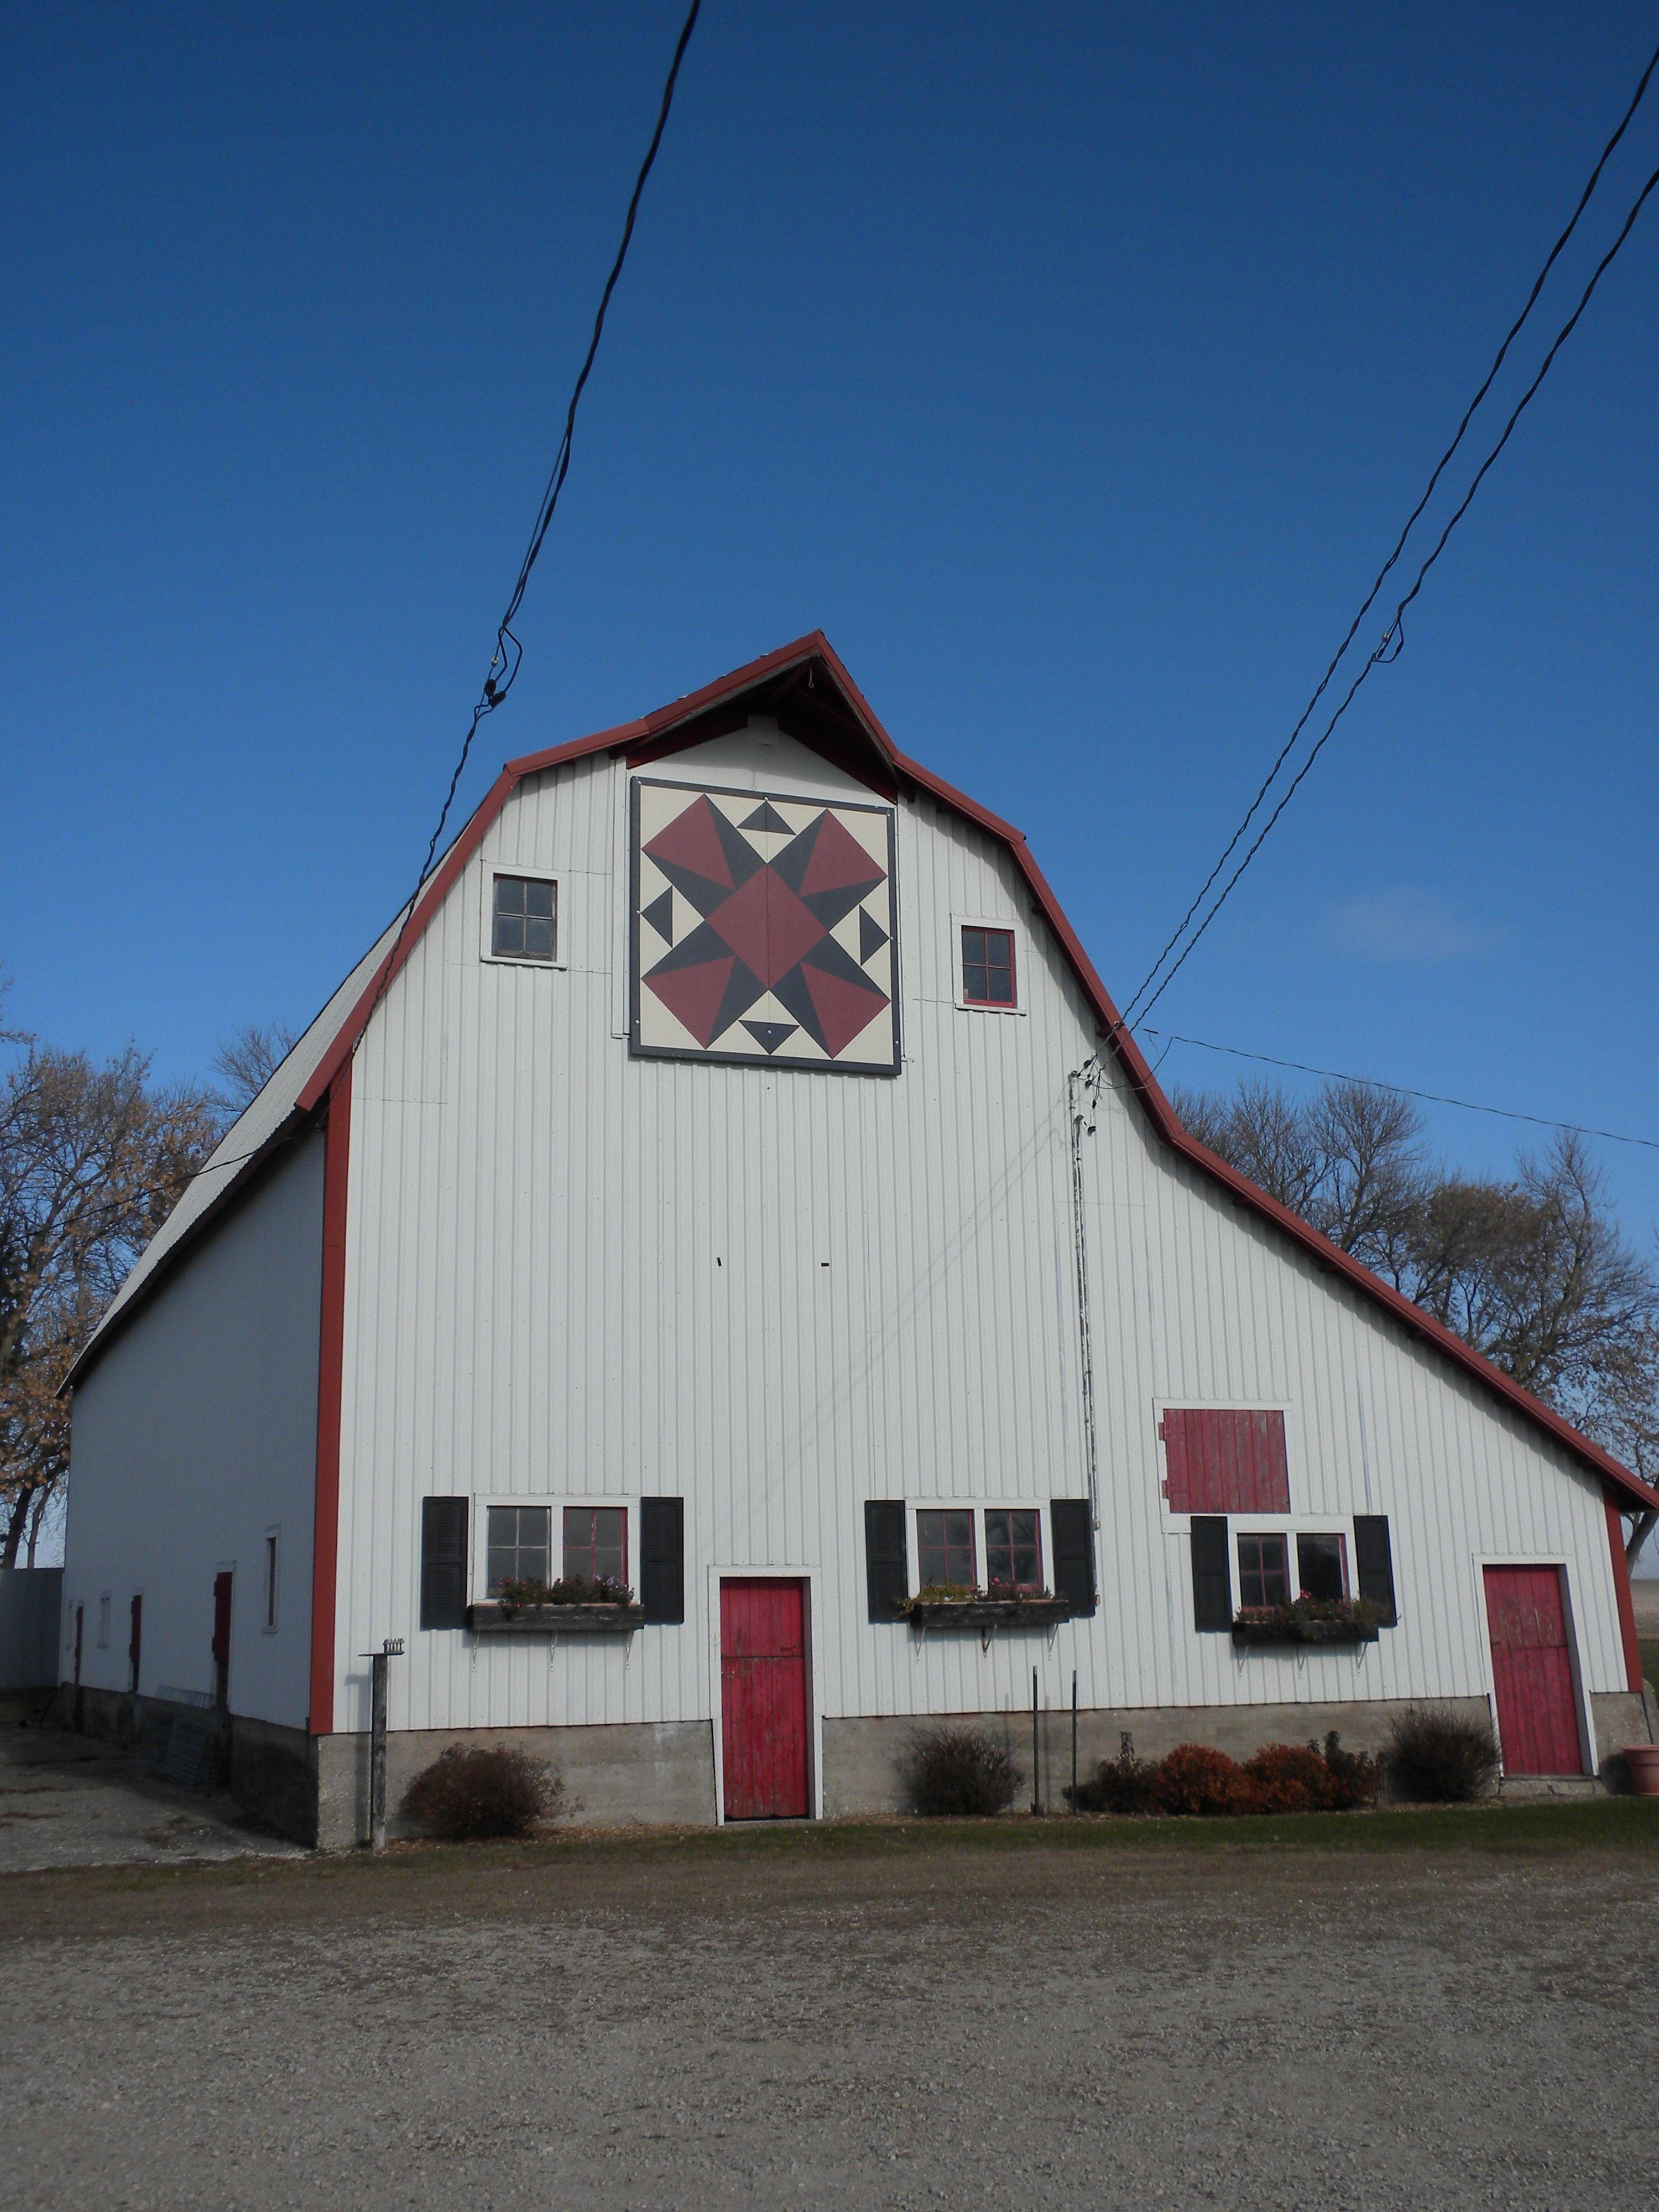 Floyd county ia old barns barn art barn quilts